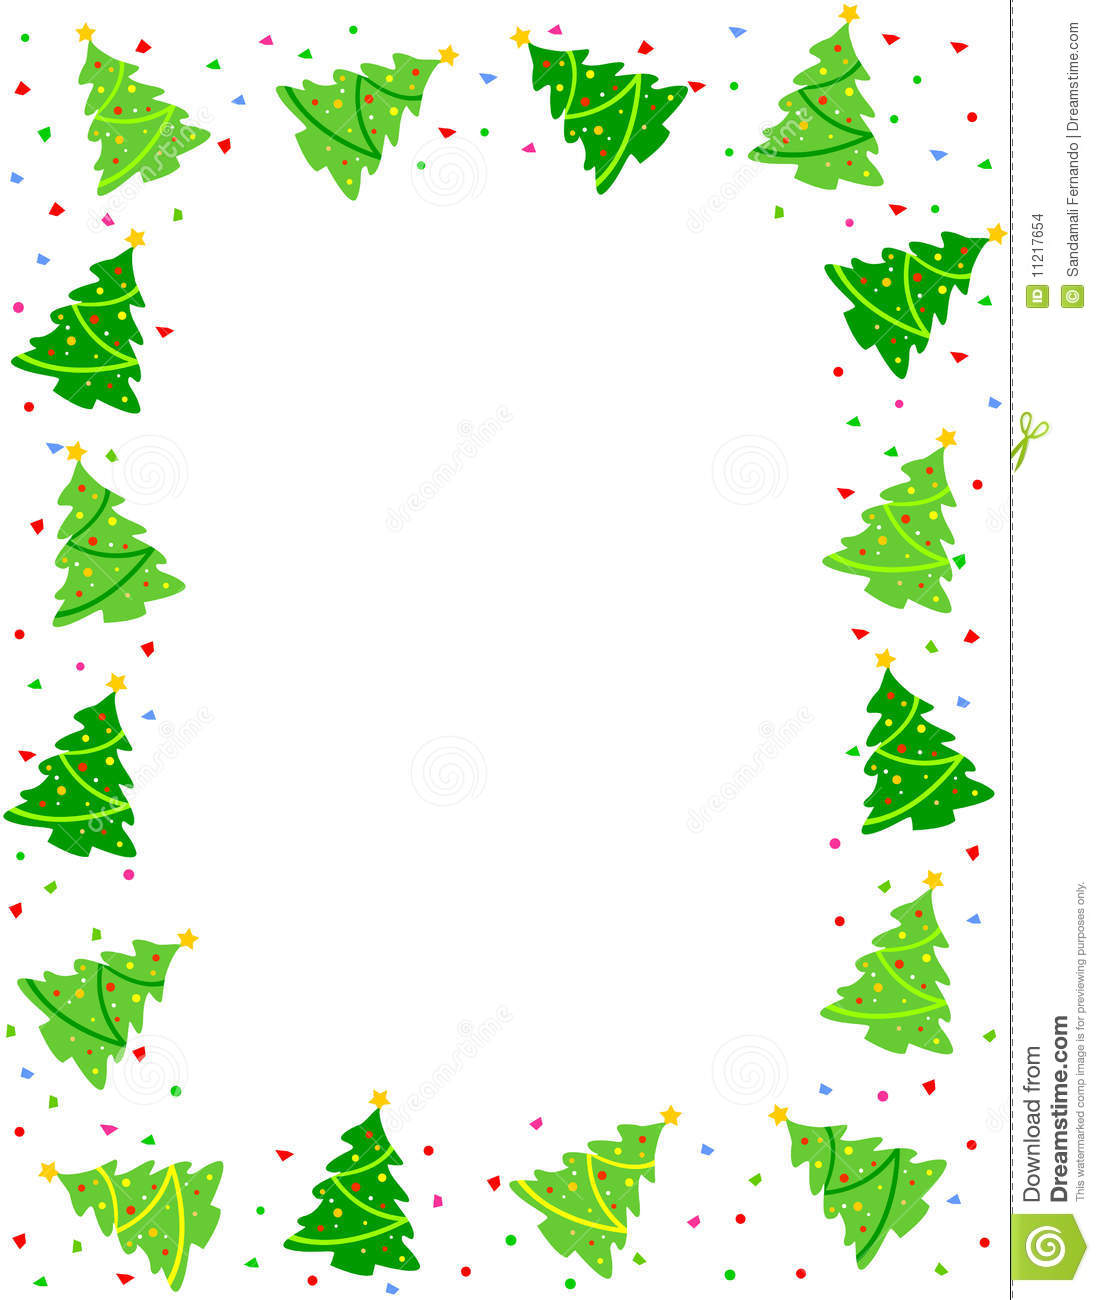 Christmas Tree Border Clipart - Clipart Kid Christmas Tree Border Clip Art Free